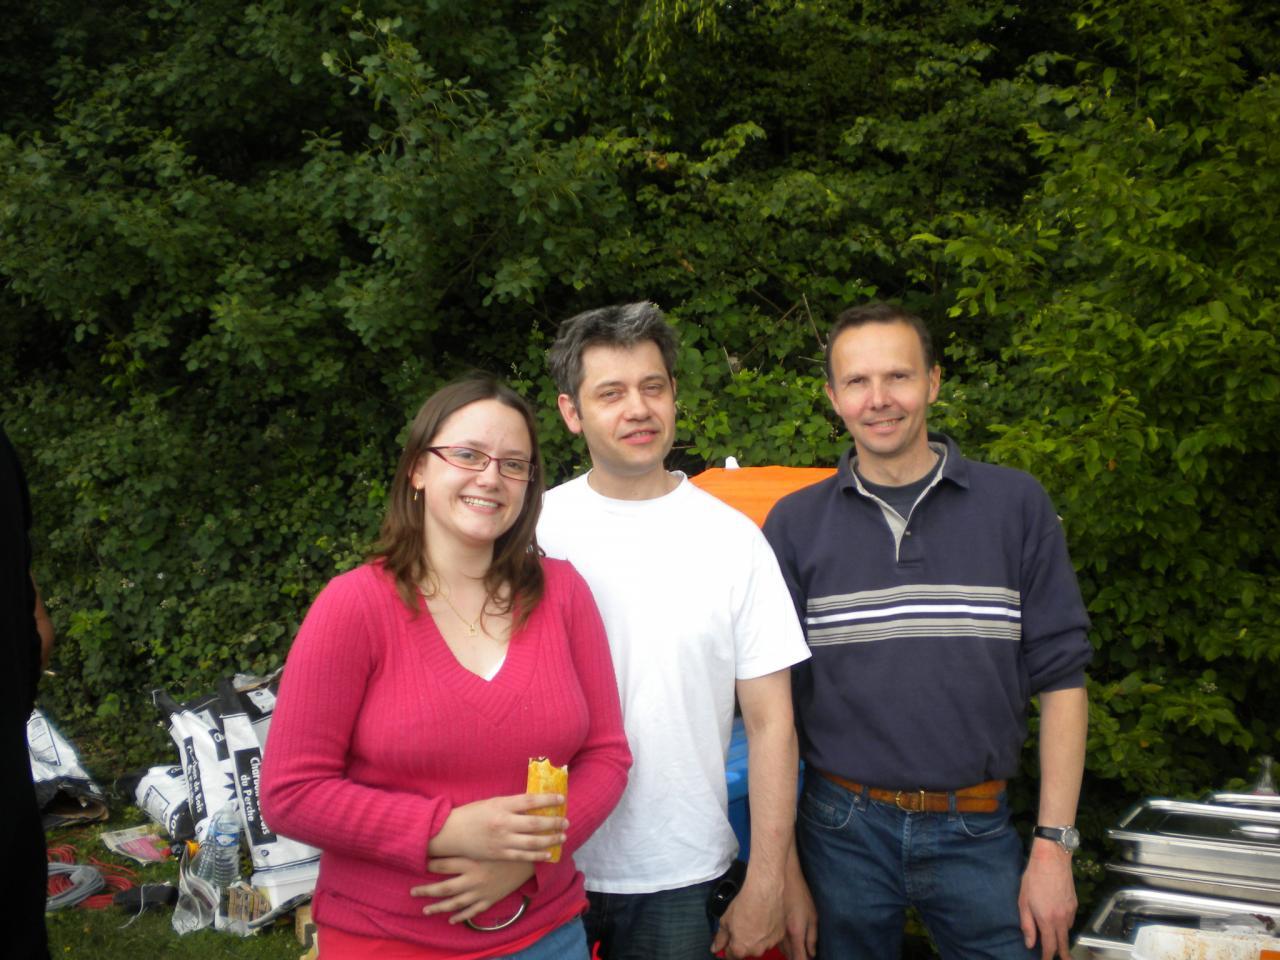 Tournoi de Conty - juin 2010